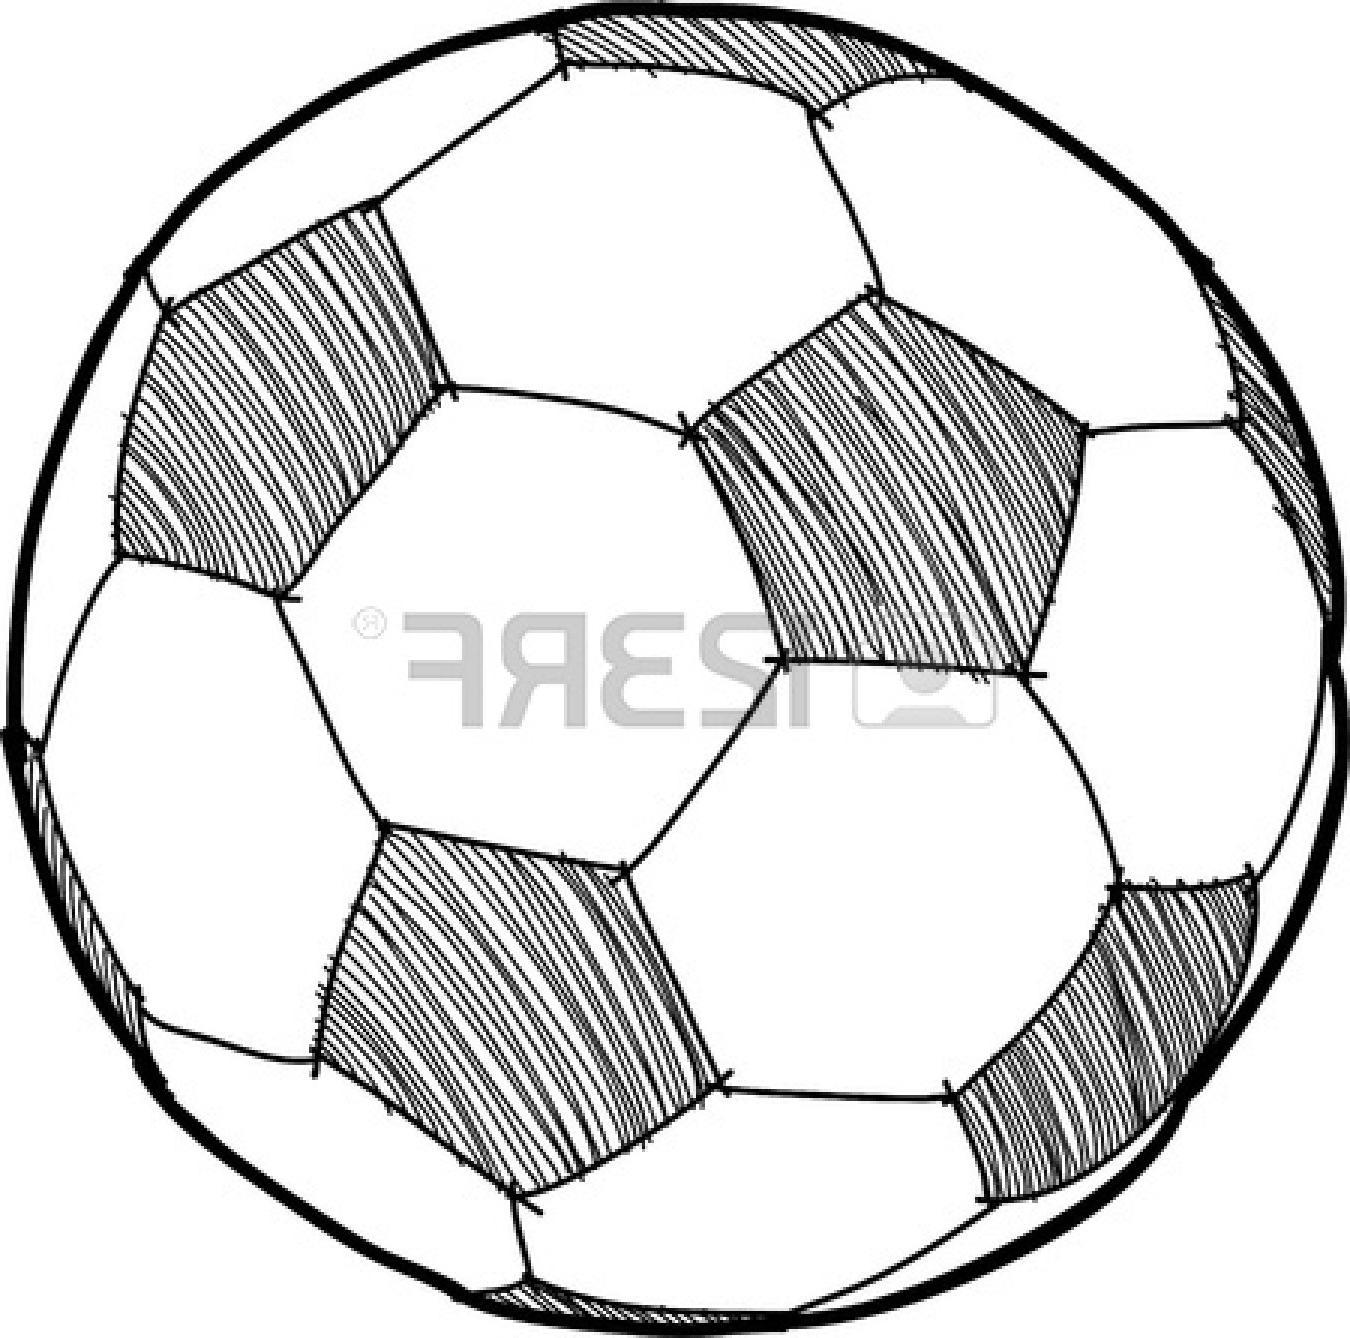 1350x1338 Hd Soccer Goal Vector Soccerball Cartoon Library